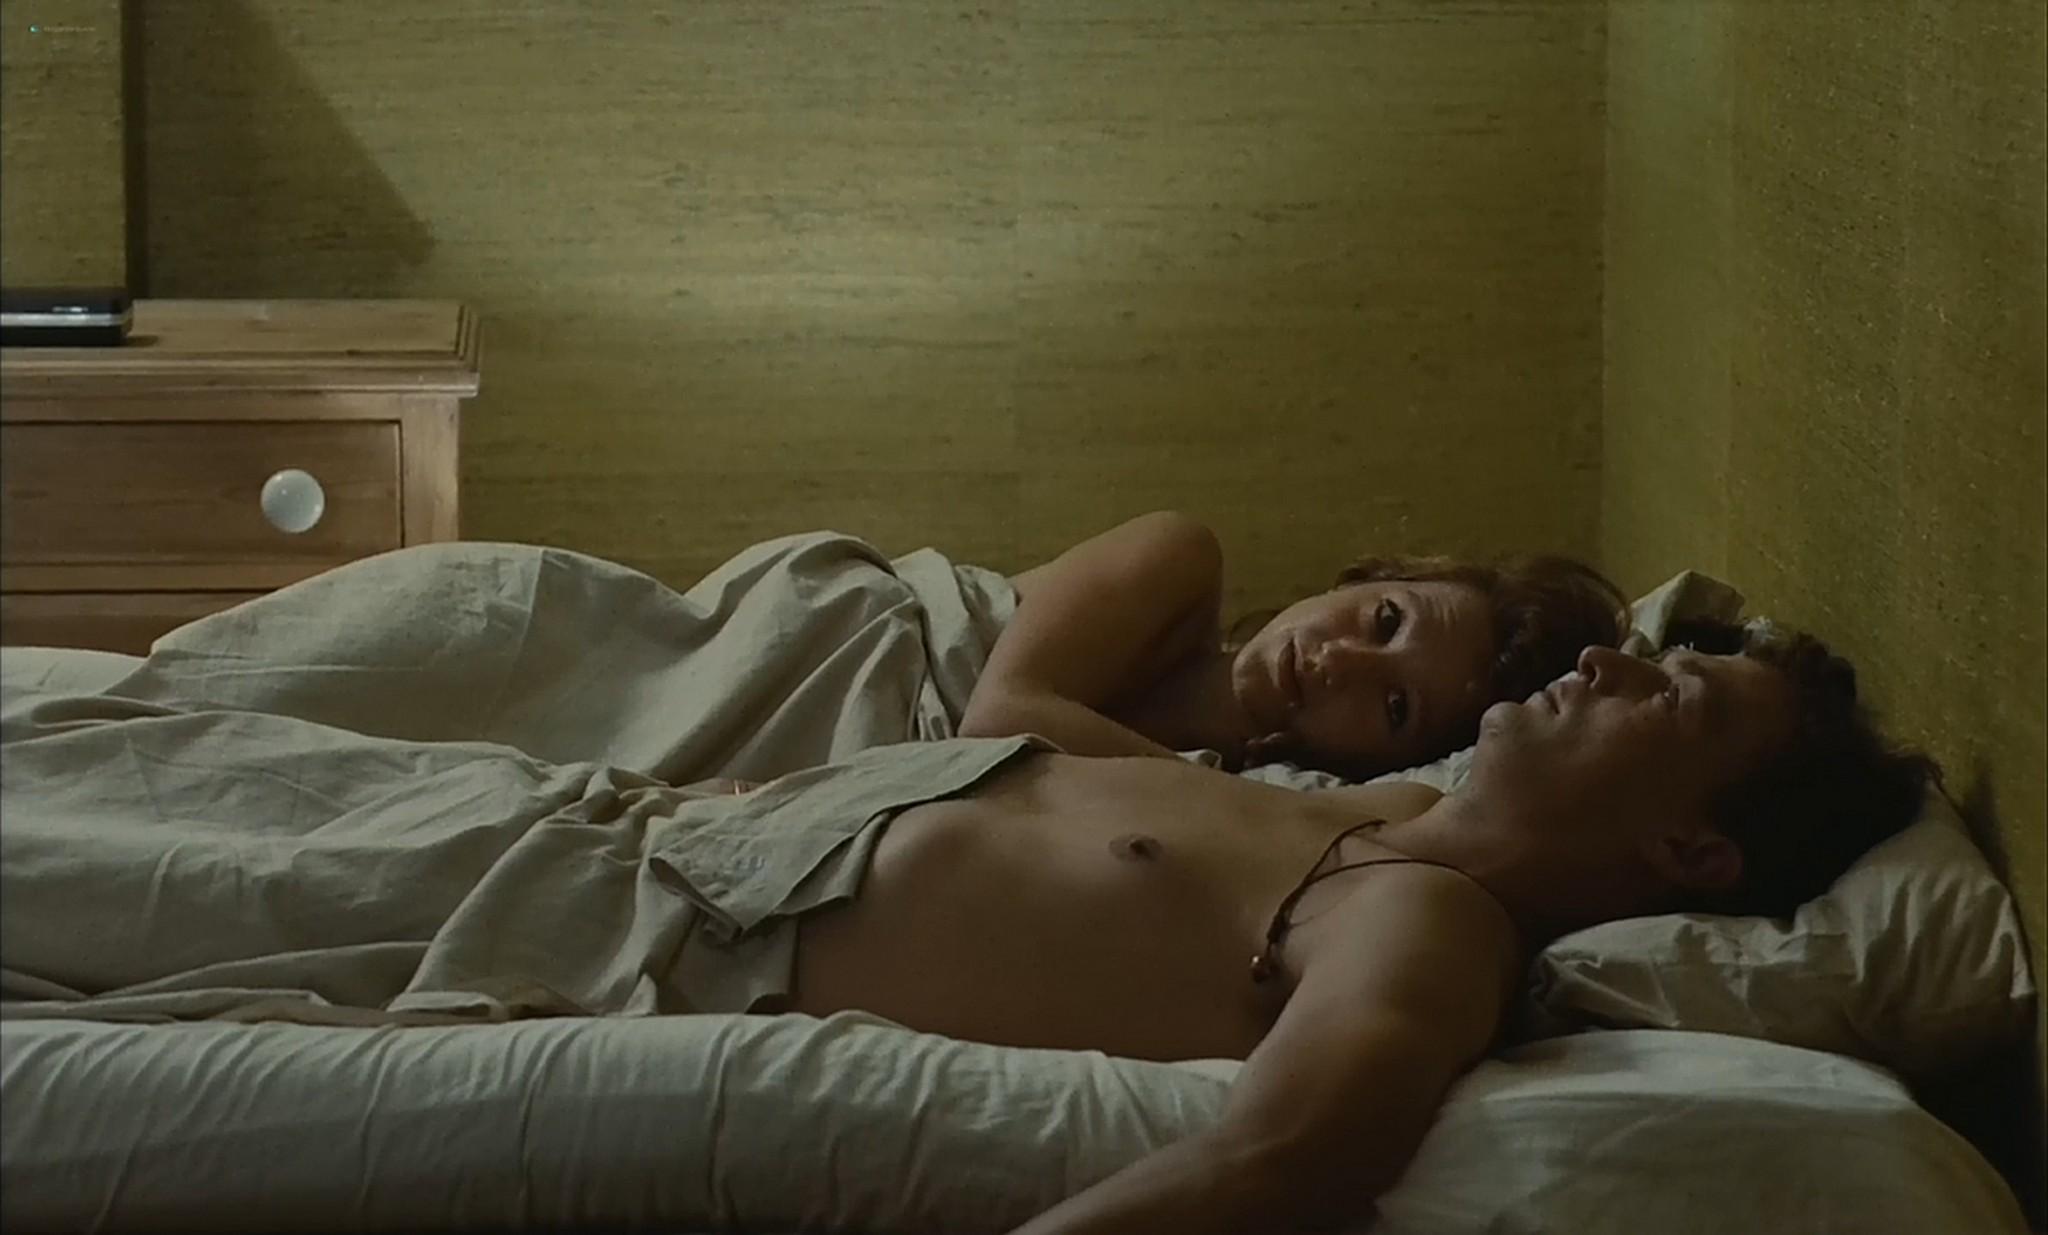 Nathalie Baye nude Marie Blanche Dehaux full frontal etc La gueule ouverte FR 1974 720p 12